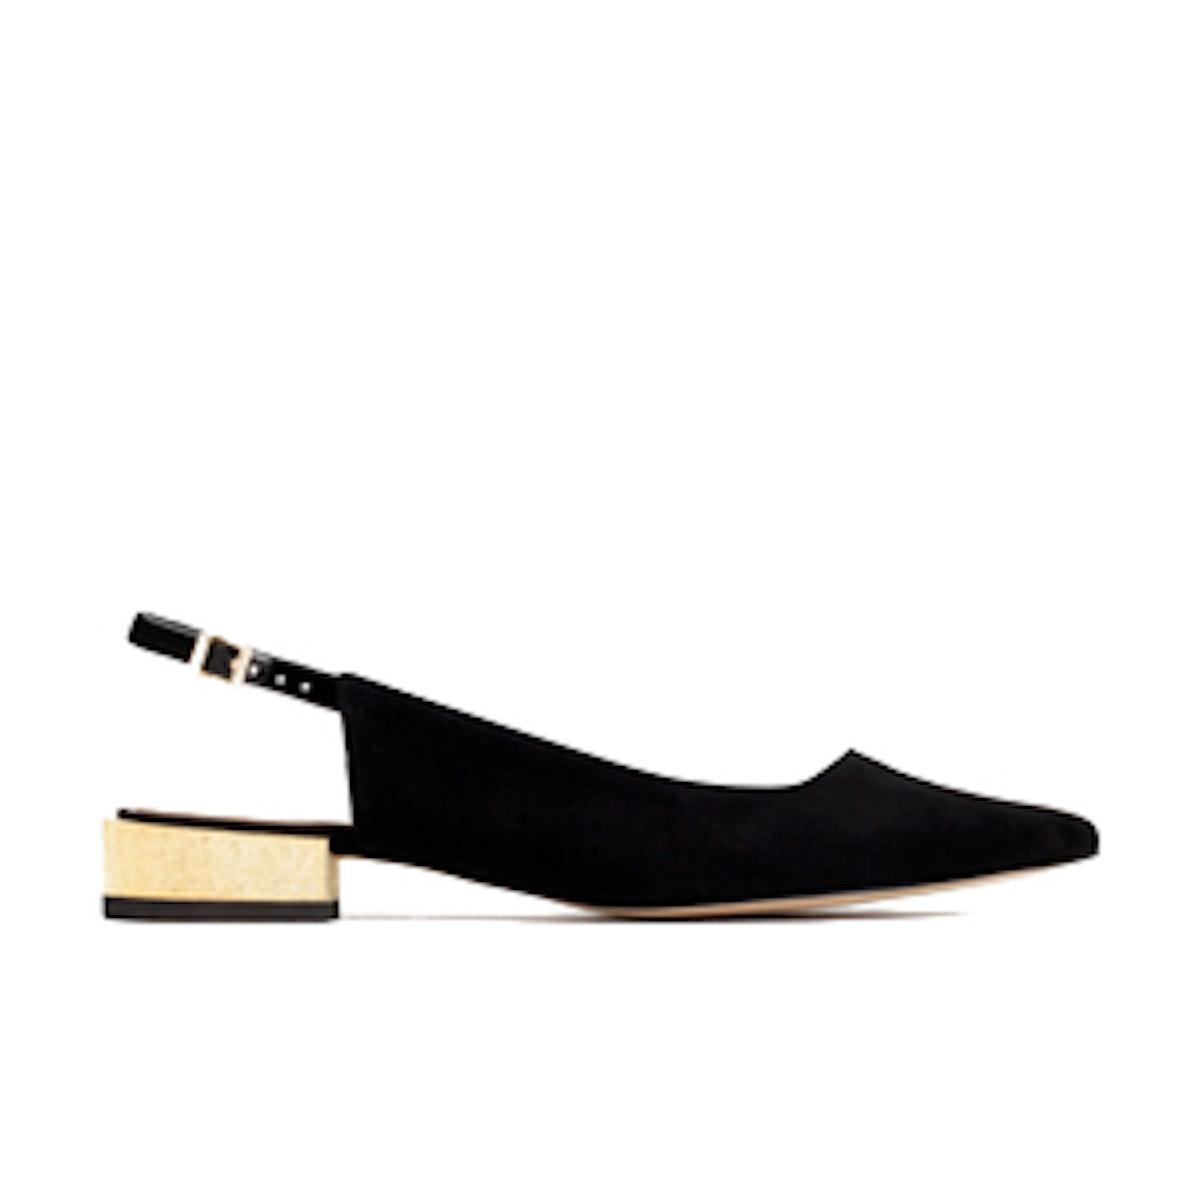 Golden Heel Leather Shoes